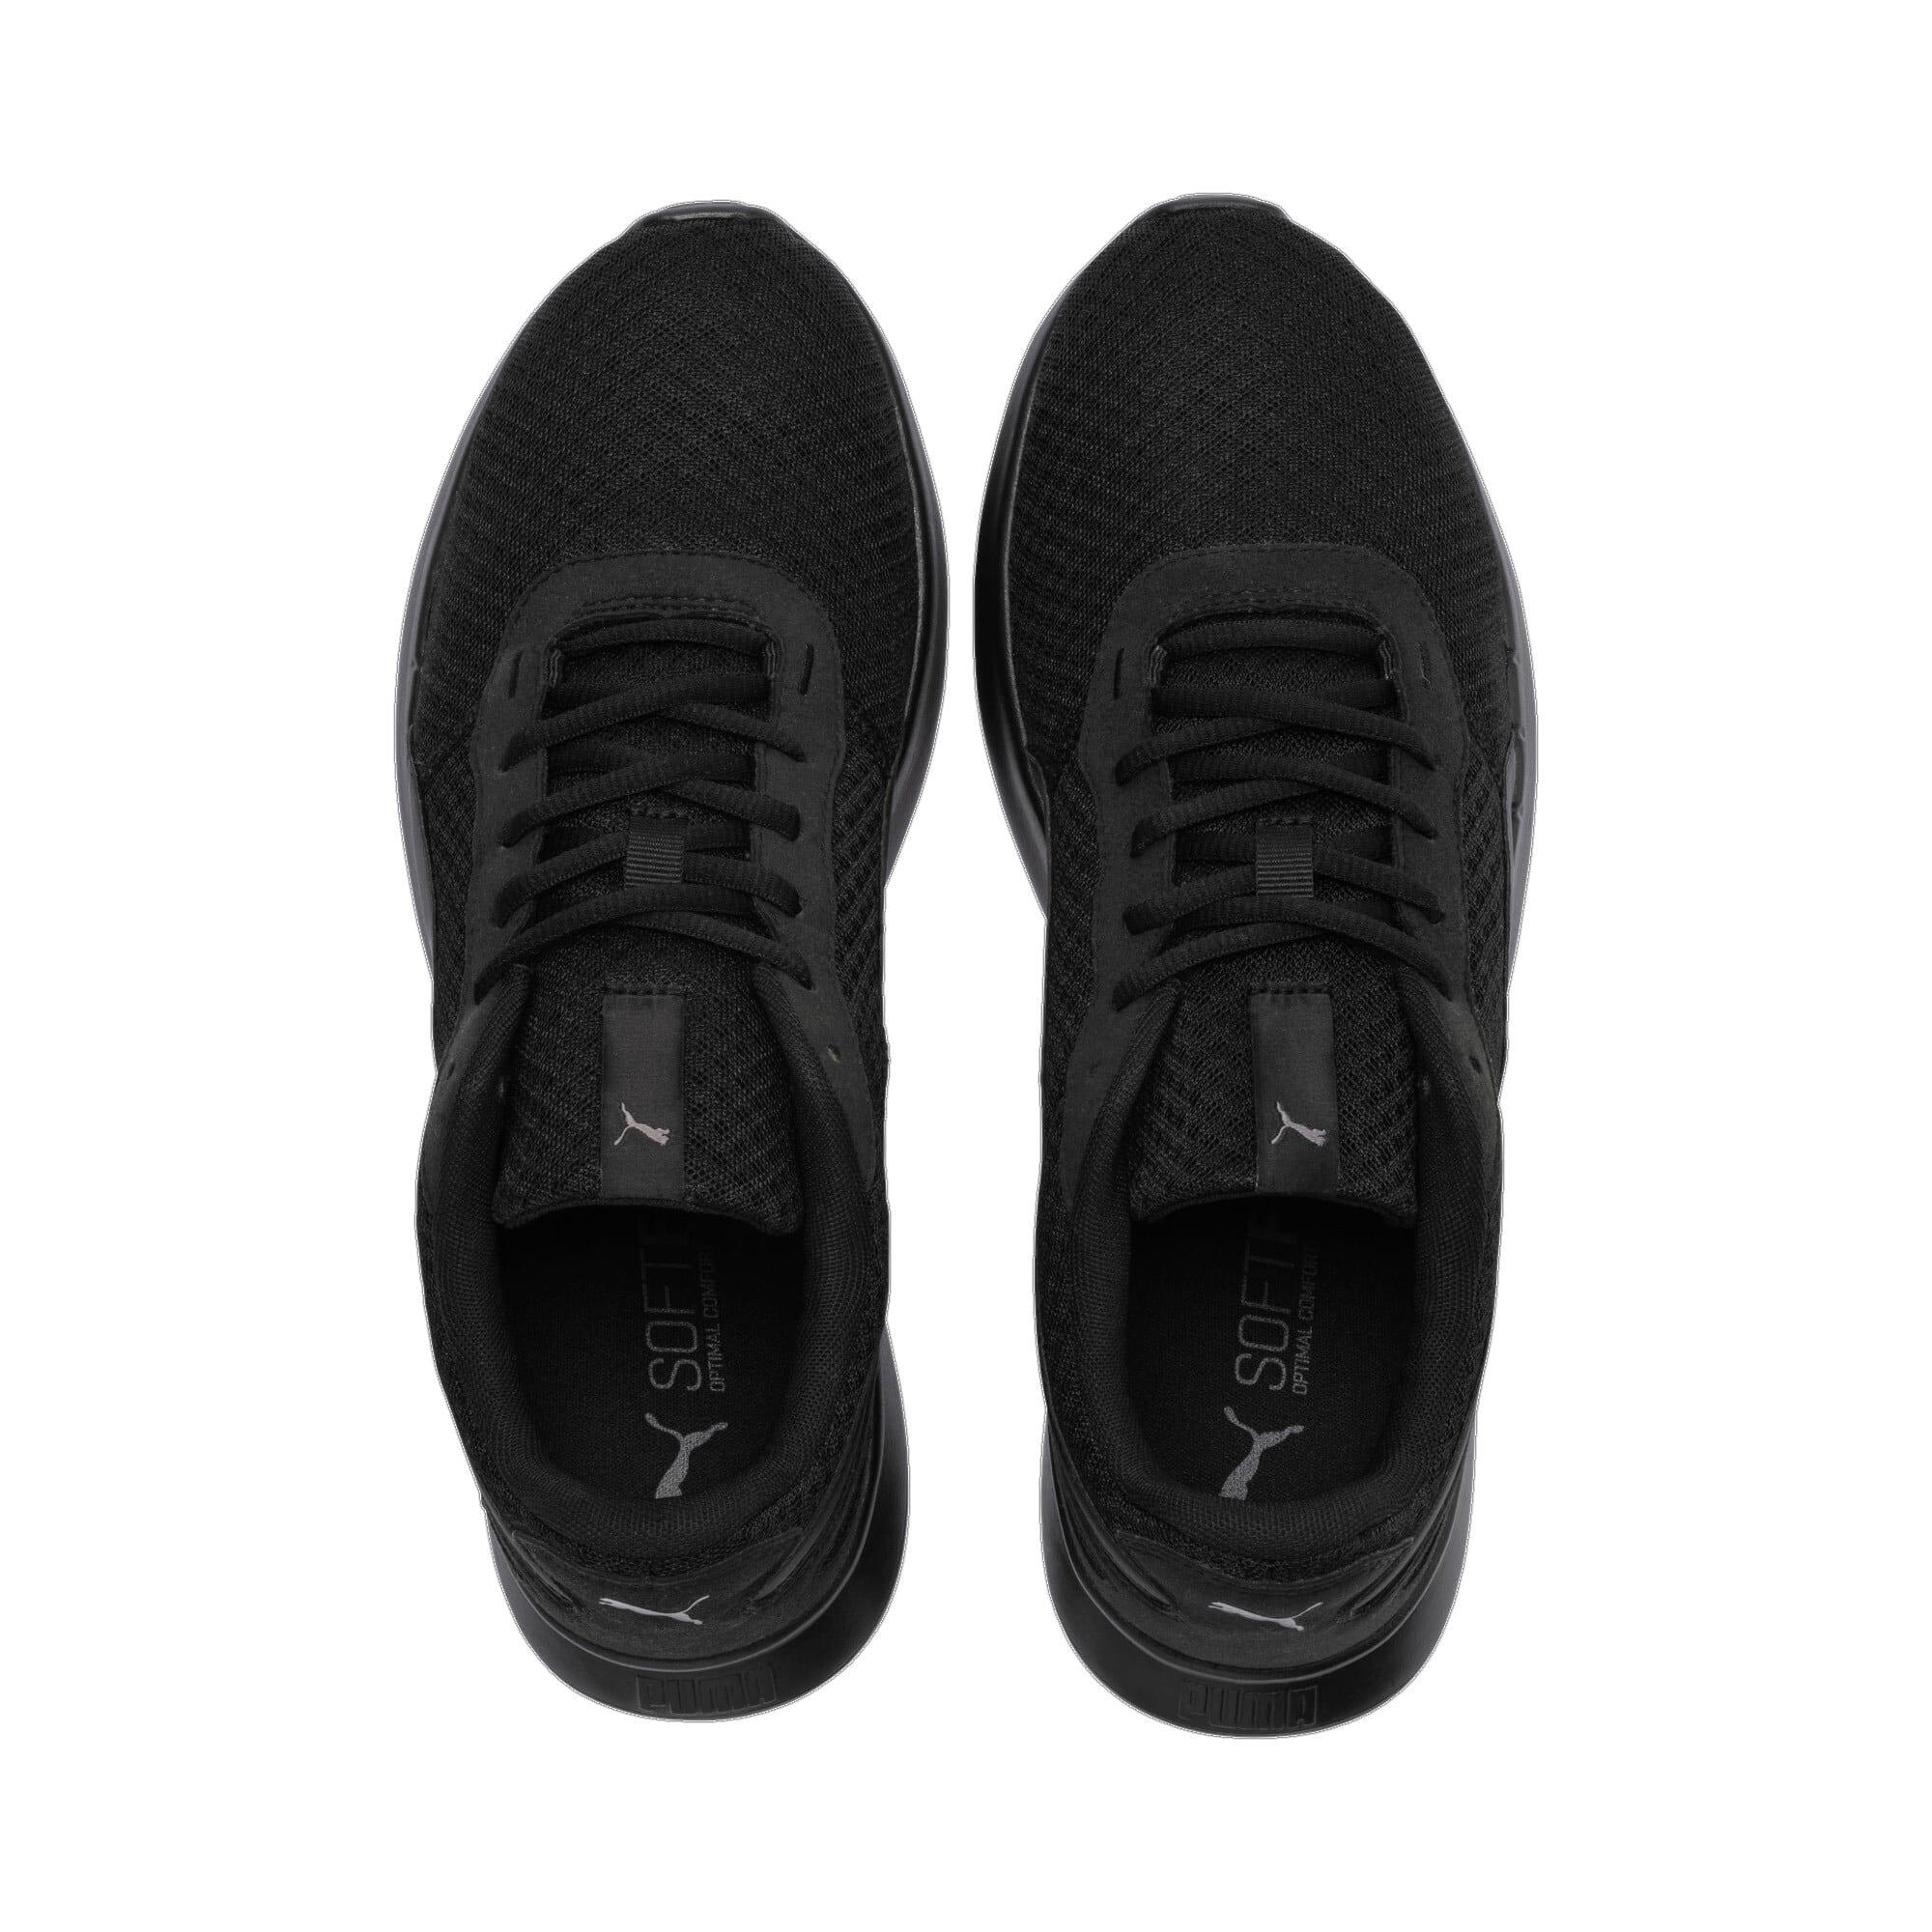 Thumbnail 6 of ST Activate Sneakers, Puma Black-Puma Black, medium